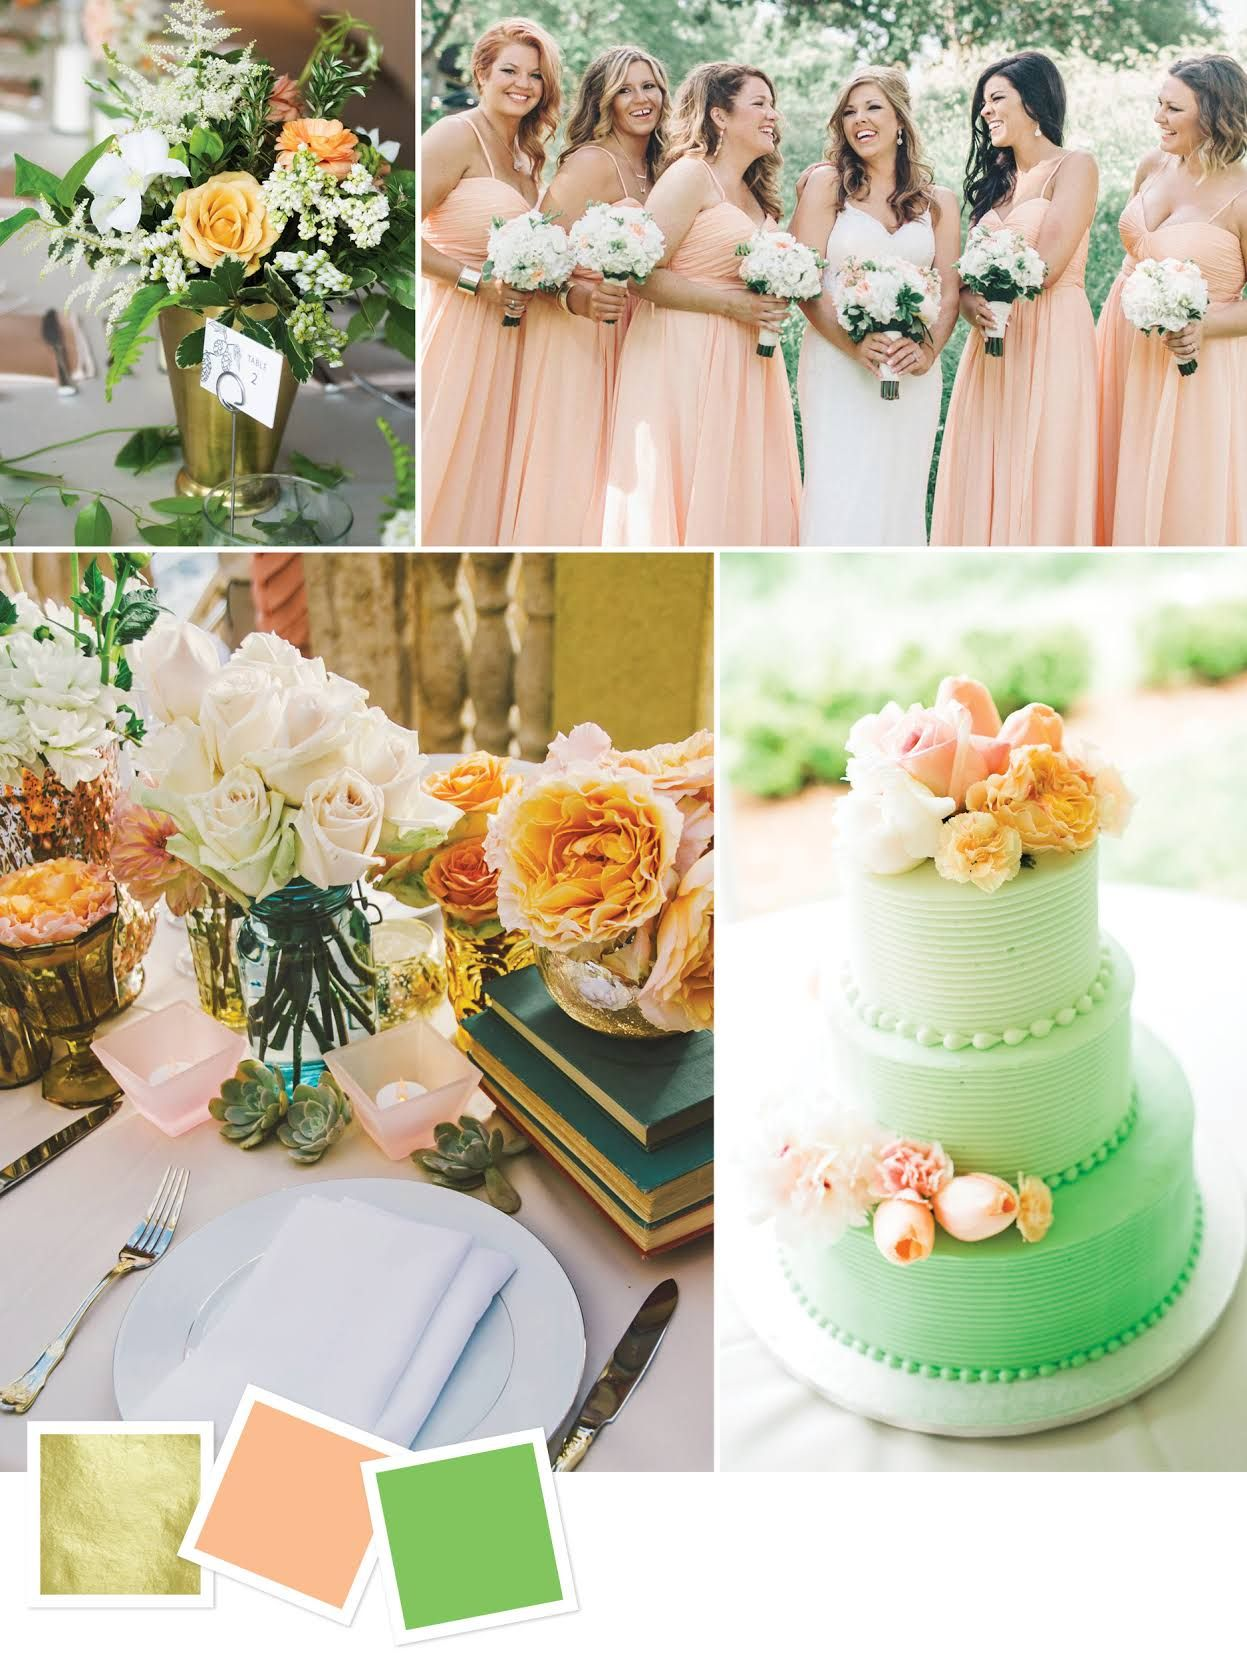 Gold  Peach  Green Good for Outdoor summer wedding